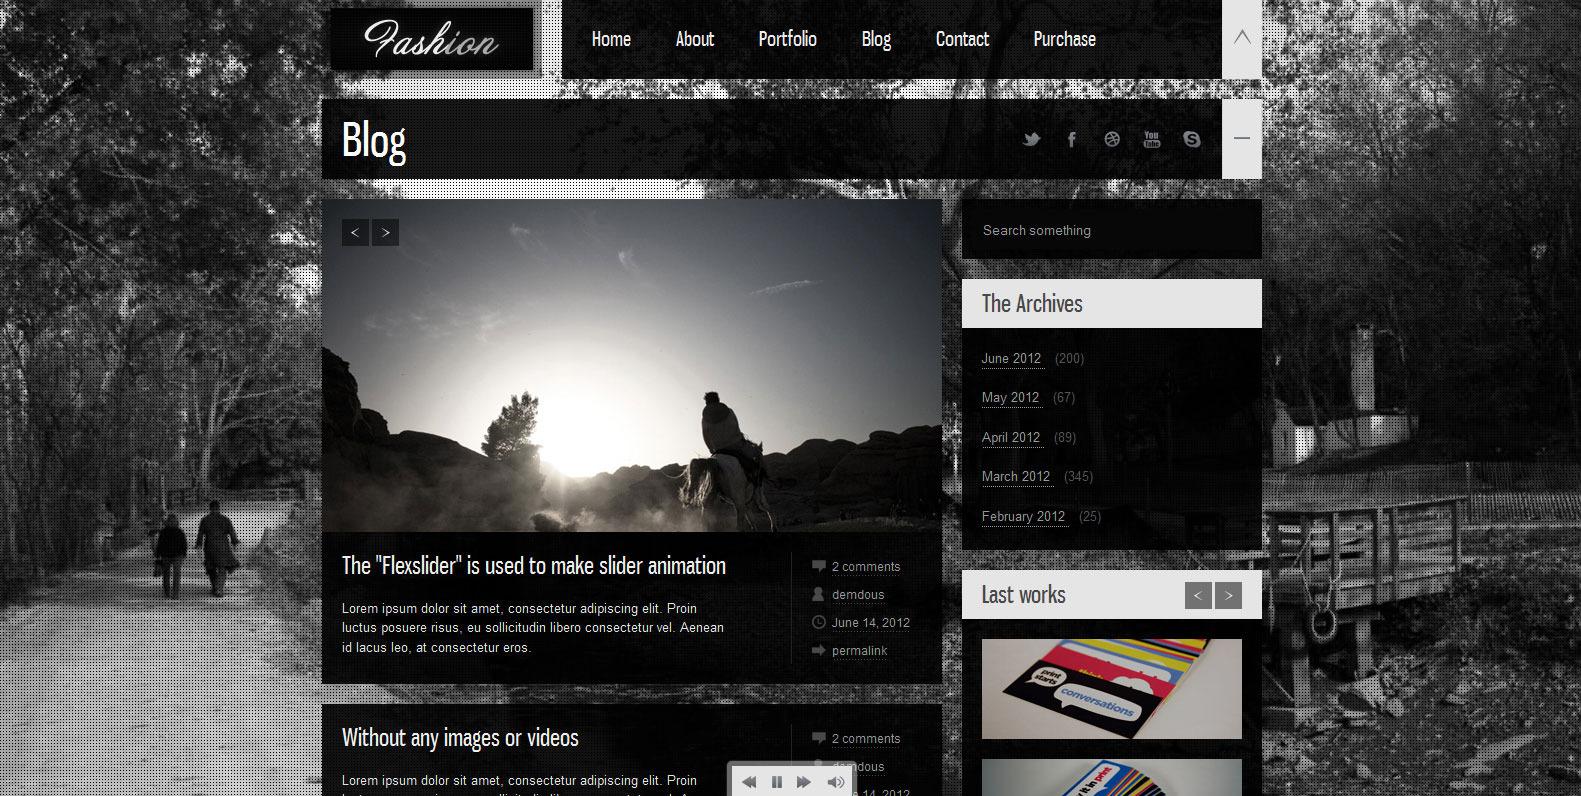 Fashion - Fullscreen Flexible And Photography